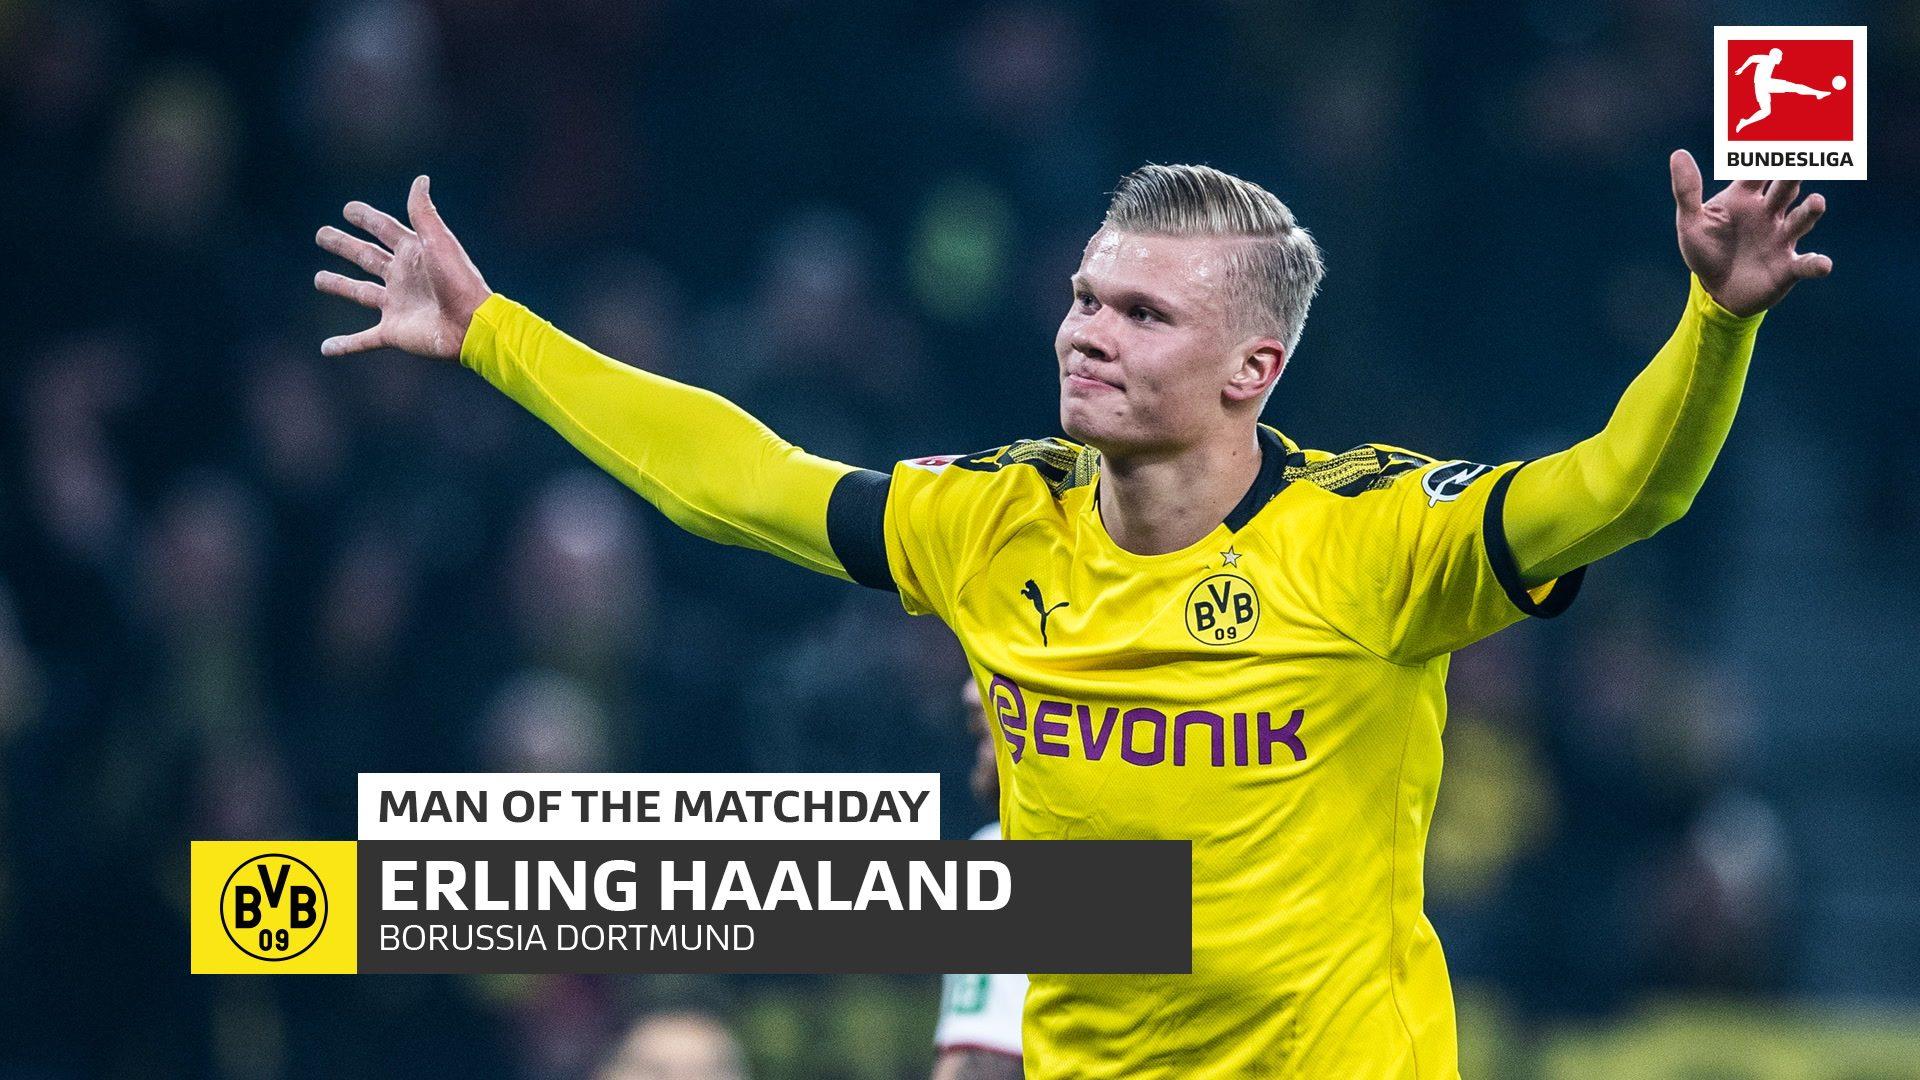 Bundesliga How Erling Haaland Has Given Borussia Dortmund A Tactical Advantage In Attack